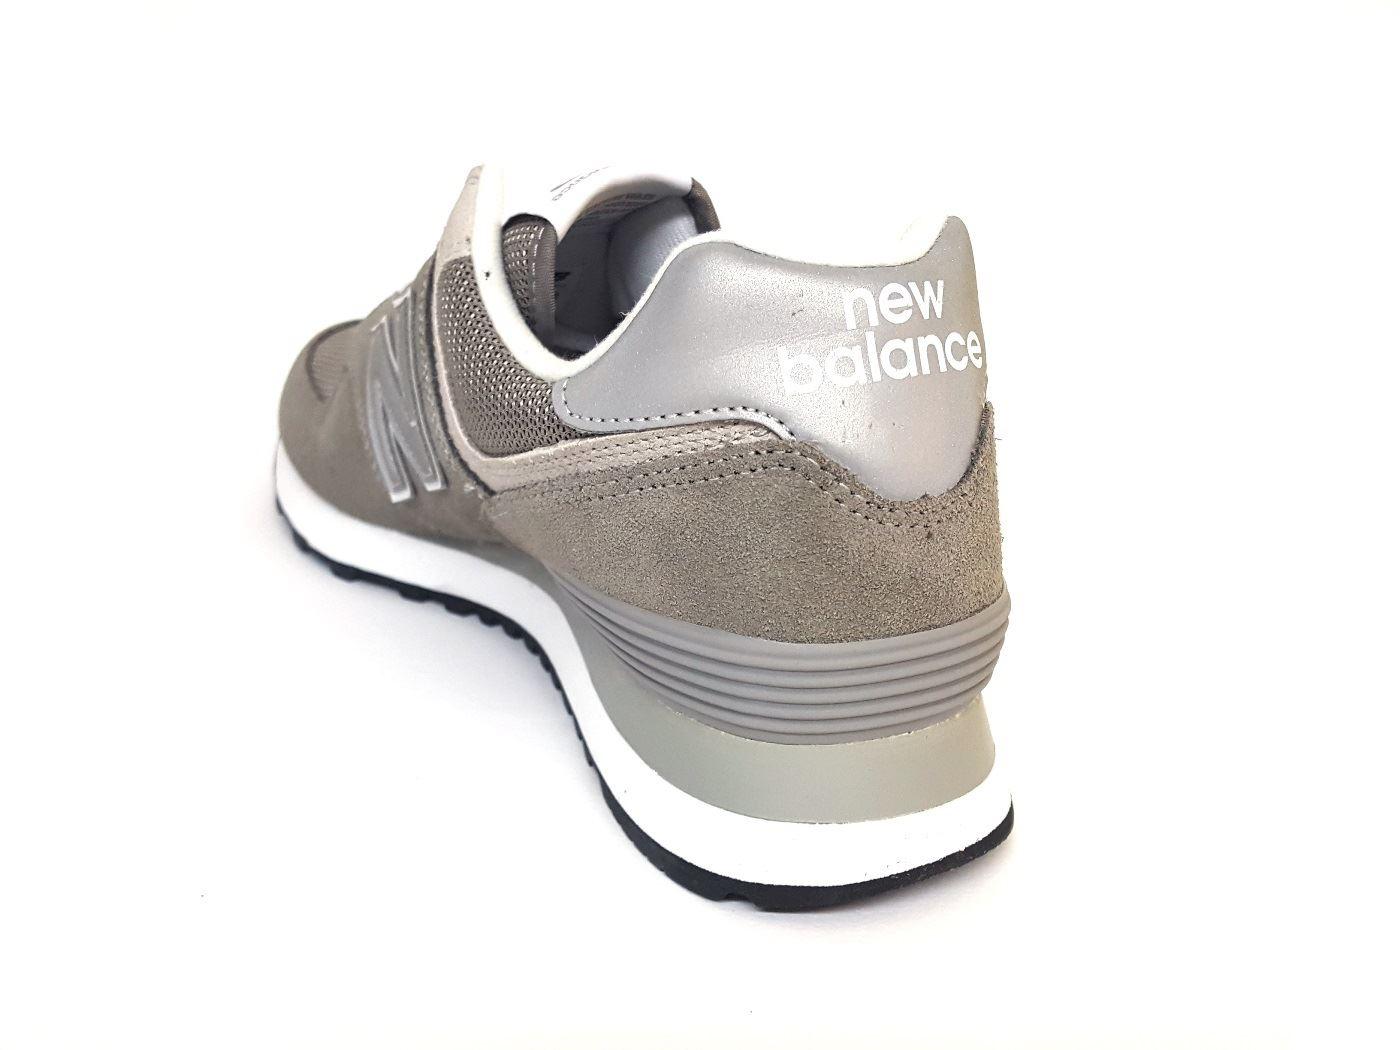 brand new 92710 0d5e6 NEW-Balance-ml574egg-Grey-Mens-Trainers-Running-Retro-